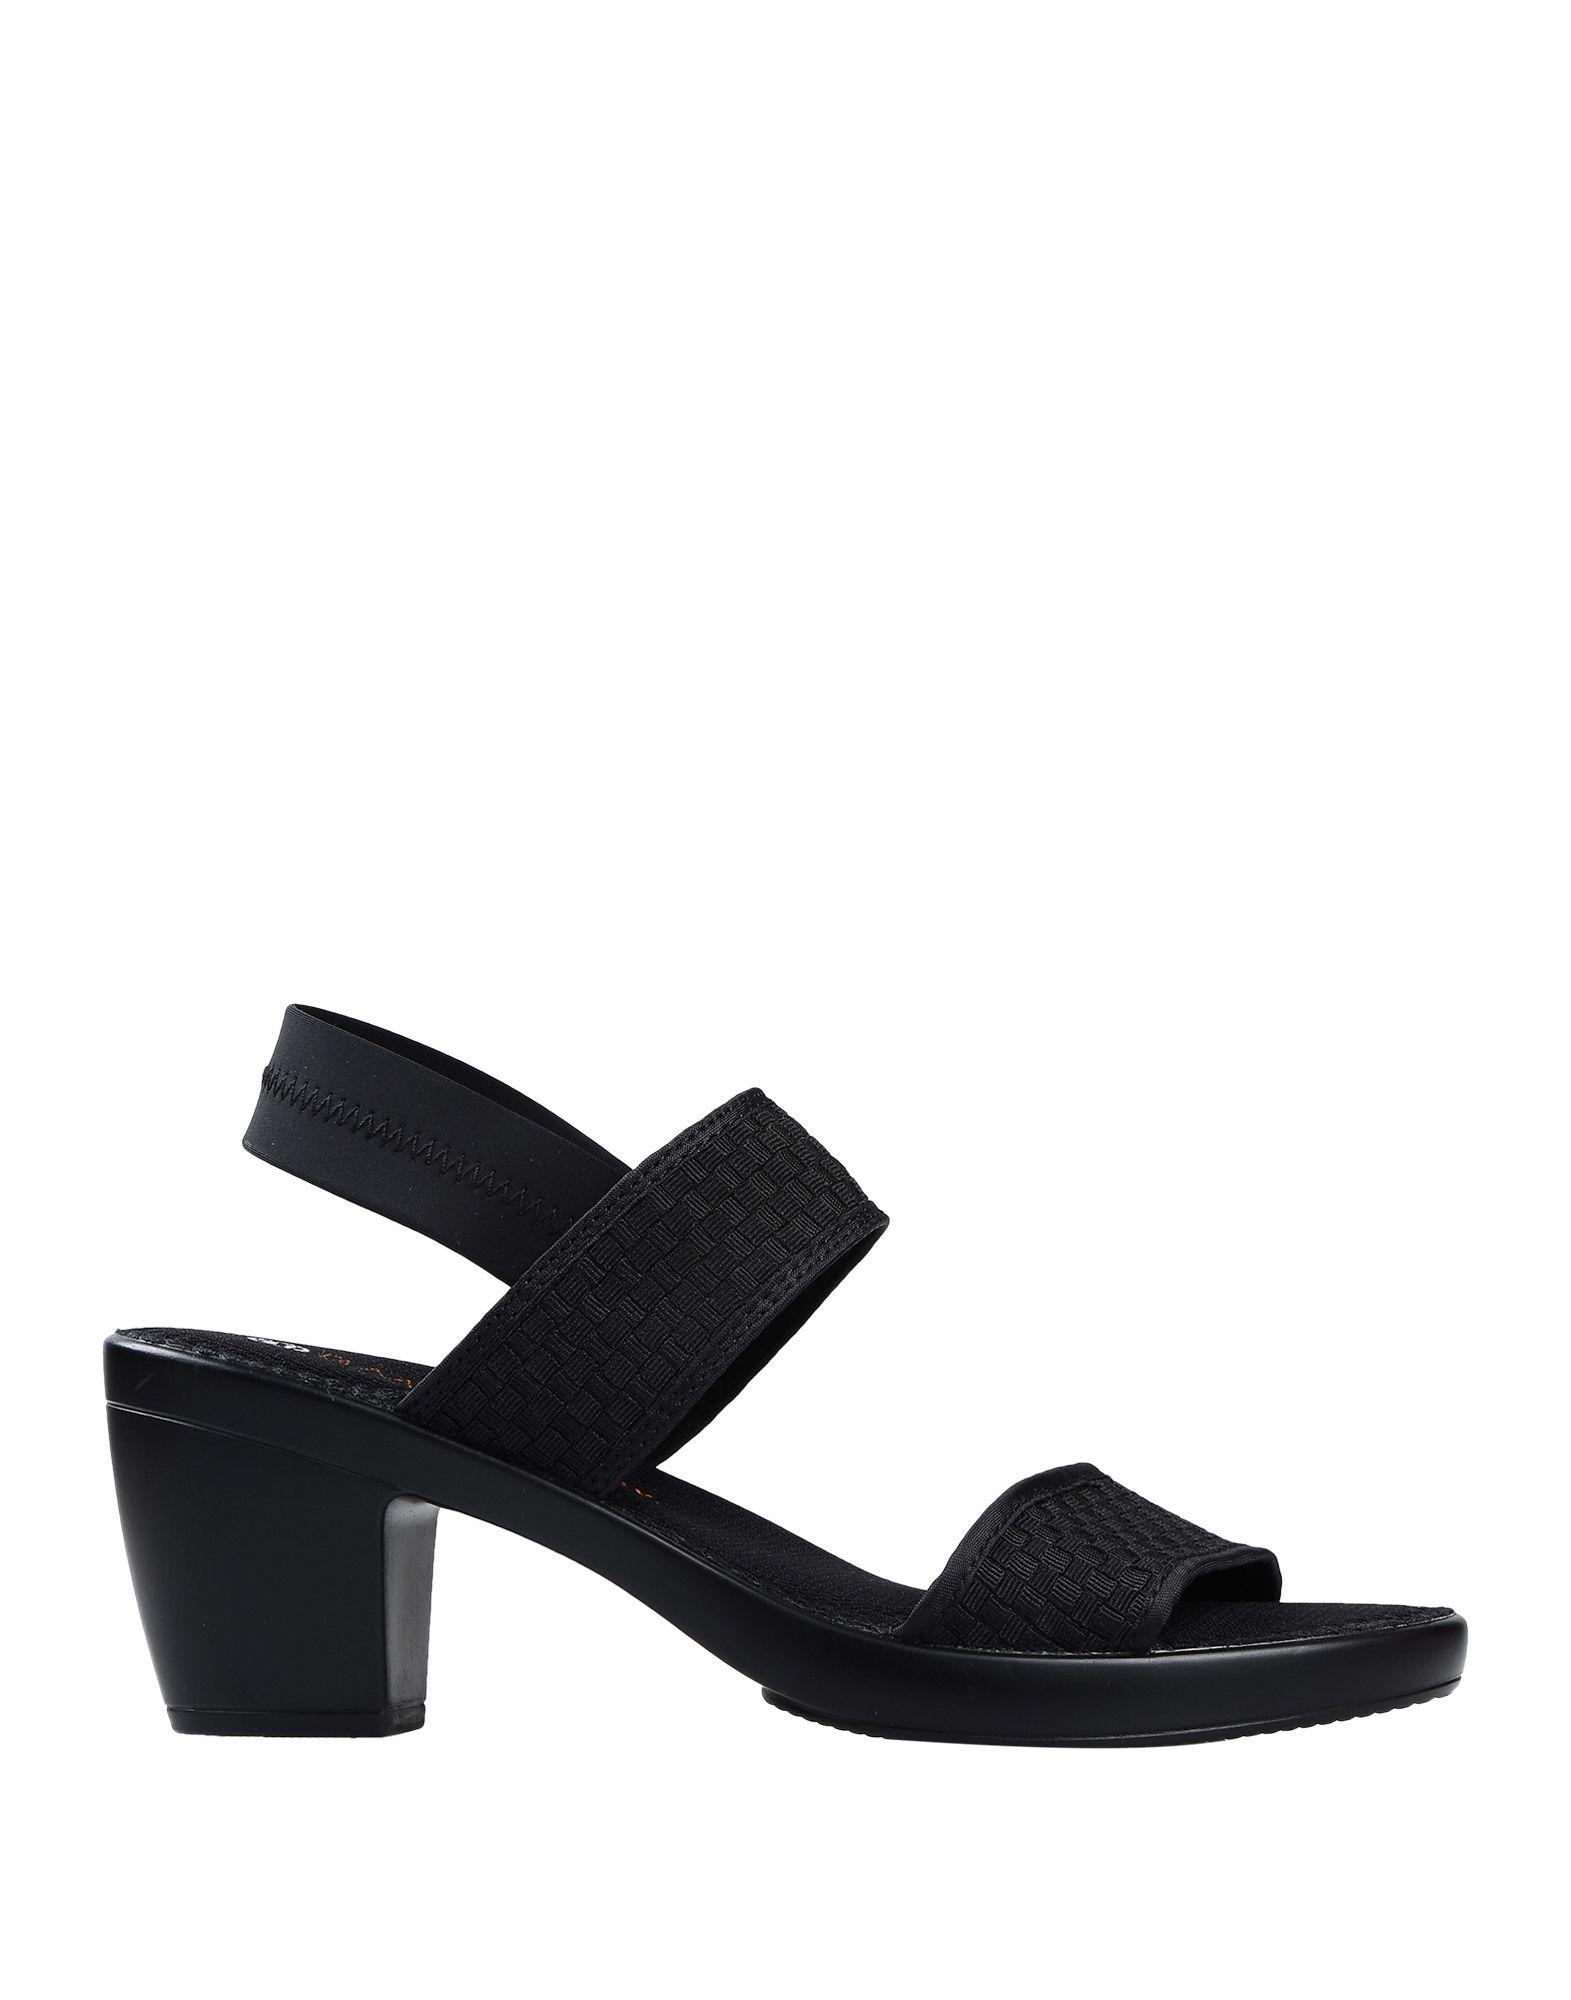 1af81b66387 Lyst - Bernie Mev Sandals in Black